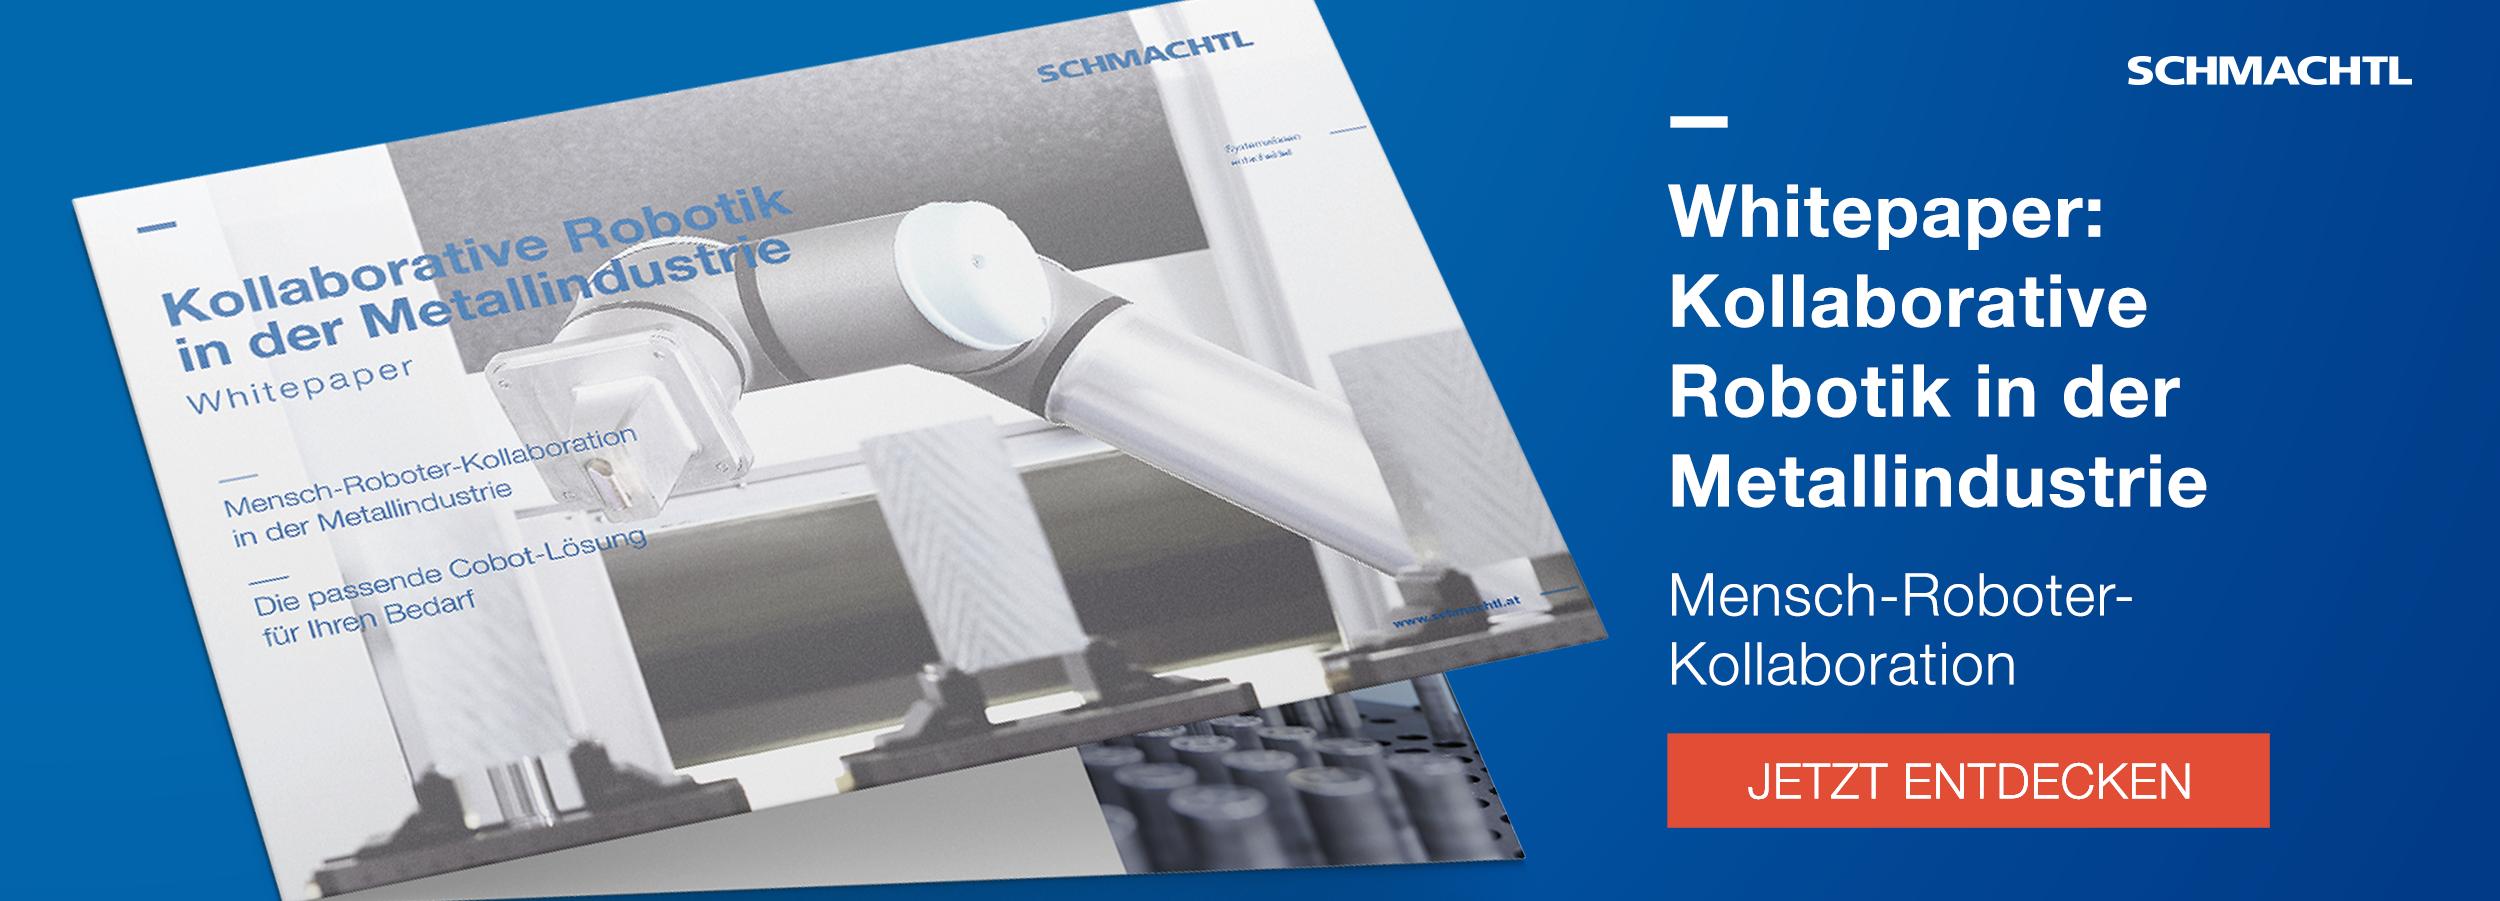 Whitepaper Kollaborative Robotik in der Metallindustrie